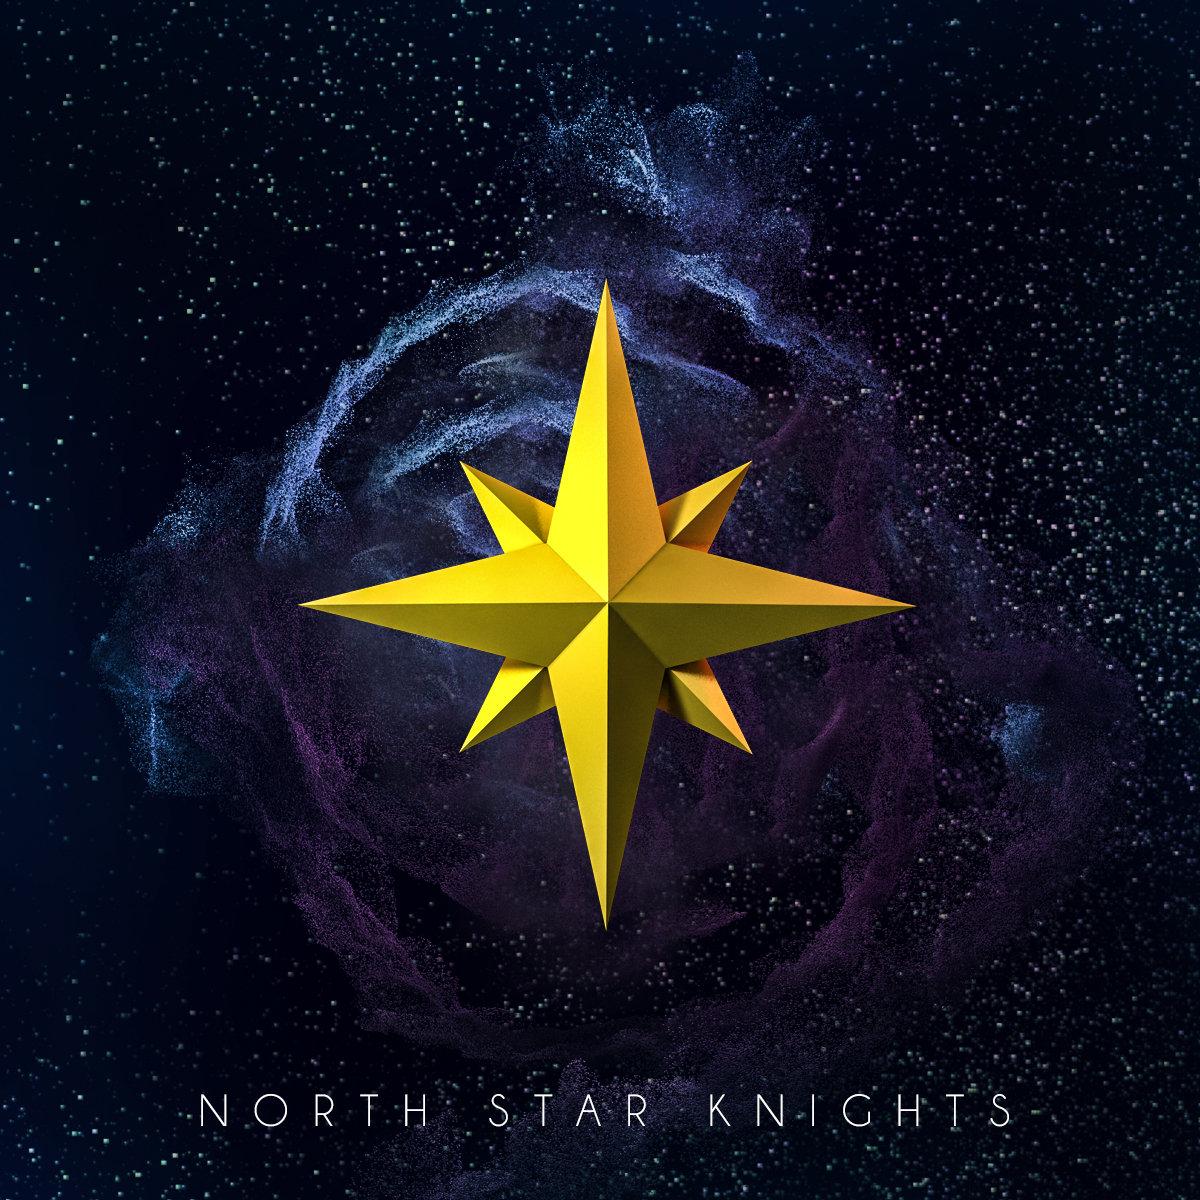 North Star Knights Dustin Thomas